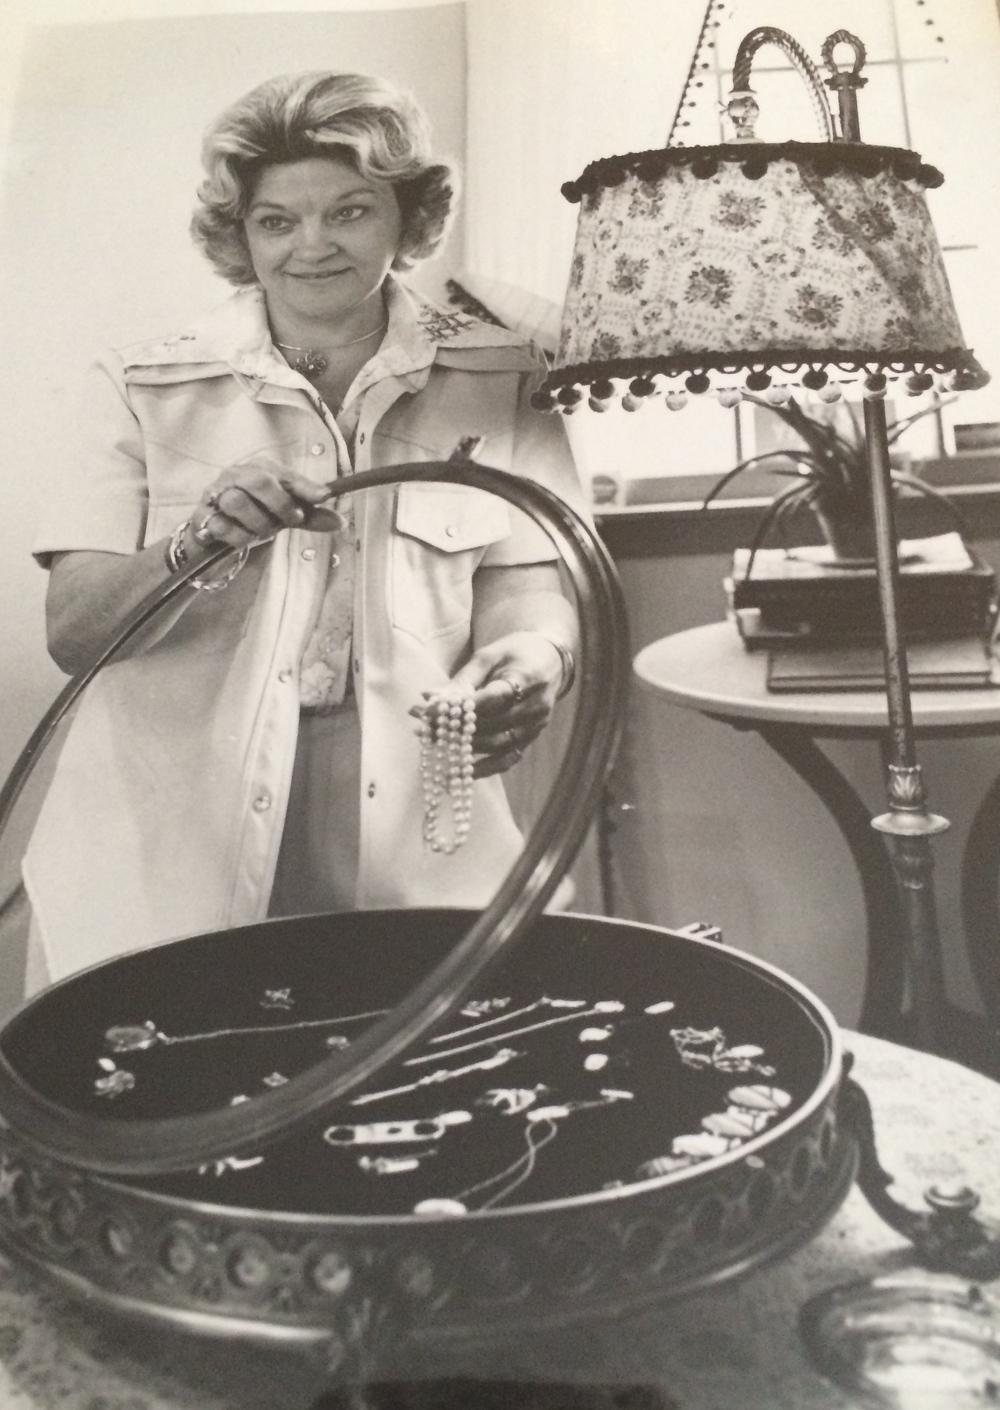 Melba Walton in the beginning of her jewelry career in Carter's Court, Franklin, TN.